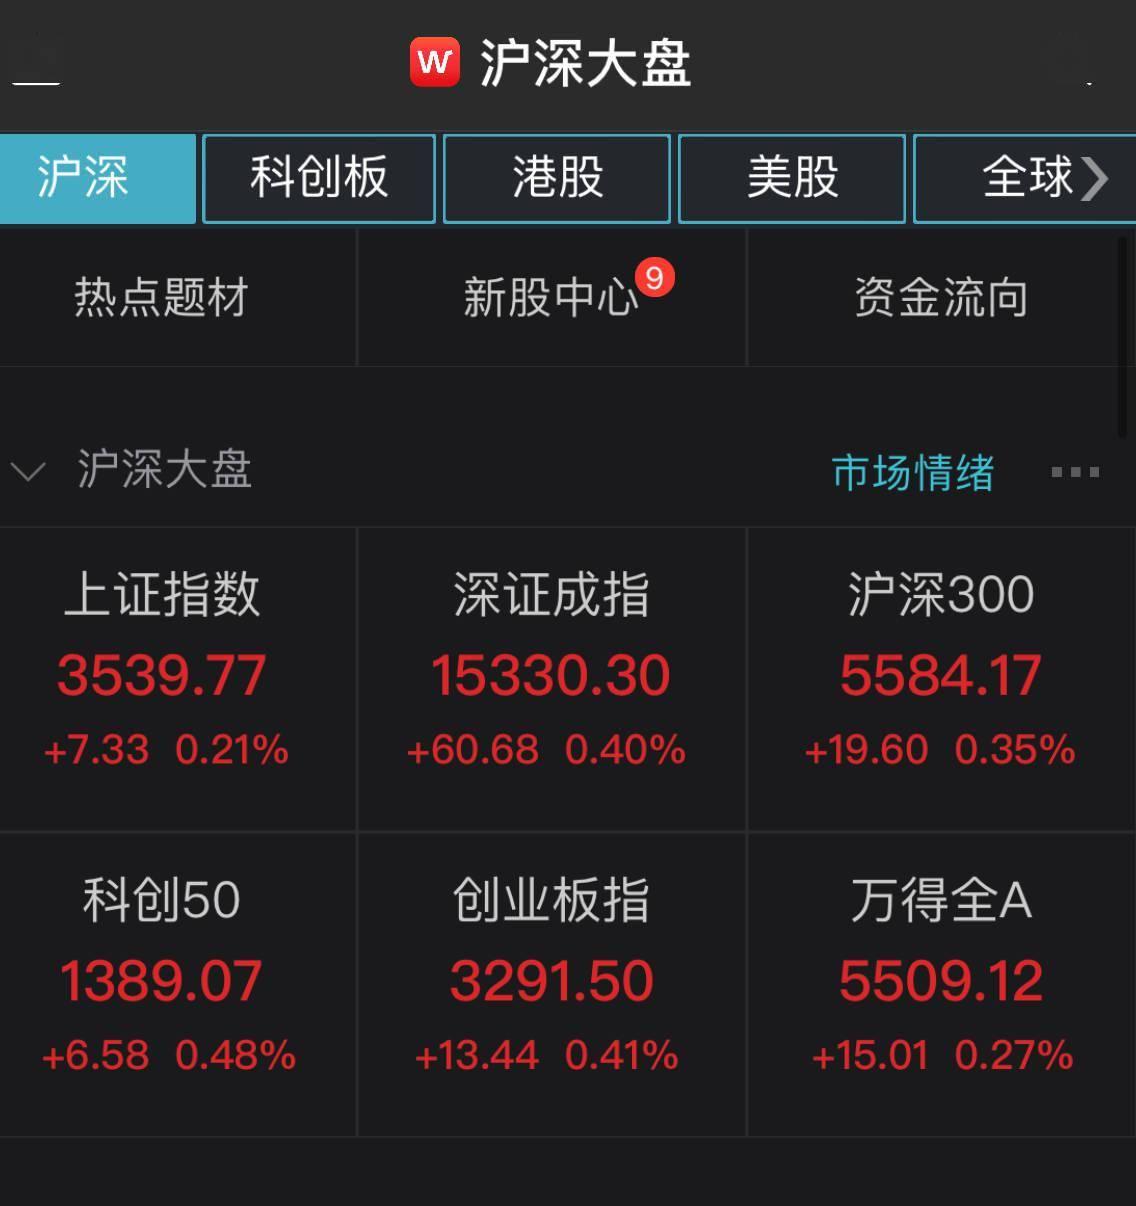 a股开盘走高,上证综指上涨0.21%,黄金板块领涨